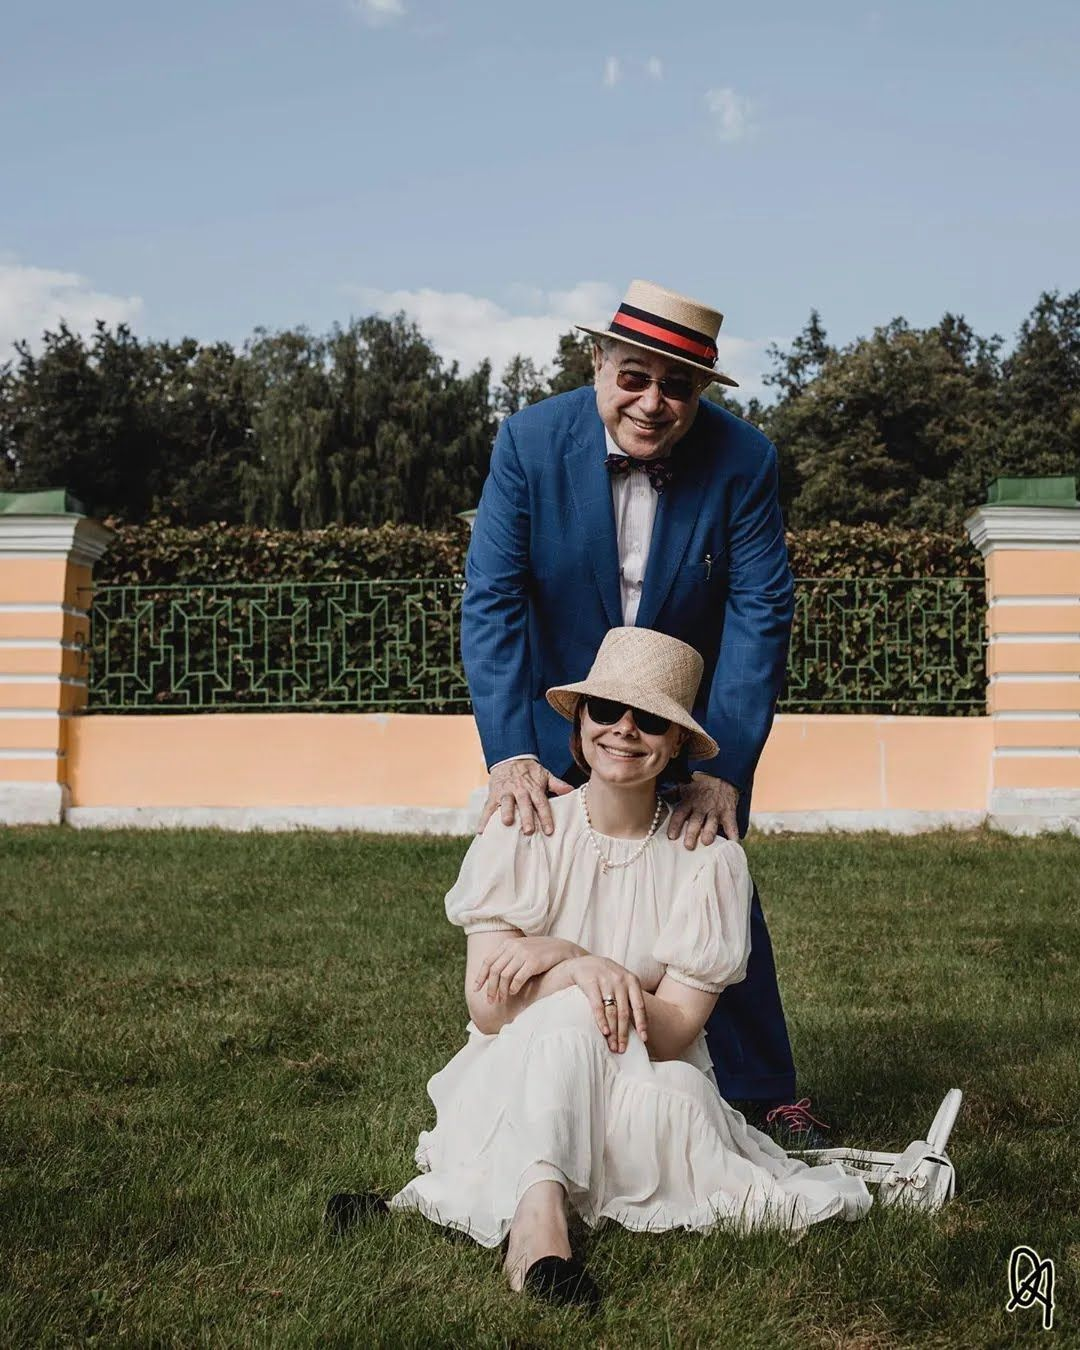 Євген Петросян і Тетяна Брухунова (Instagram Тетяни Брухуновой)